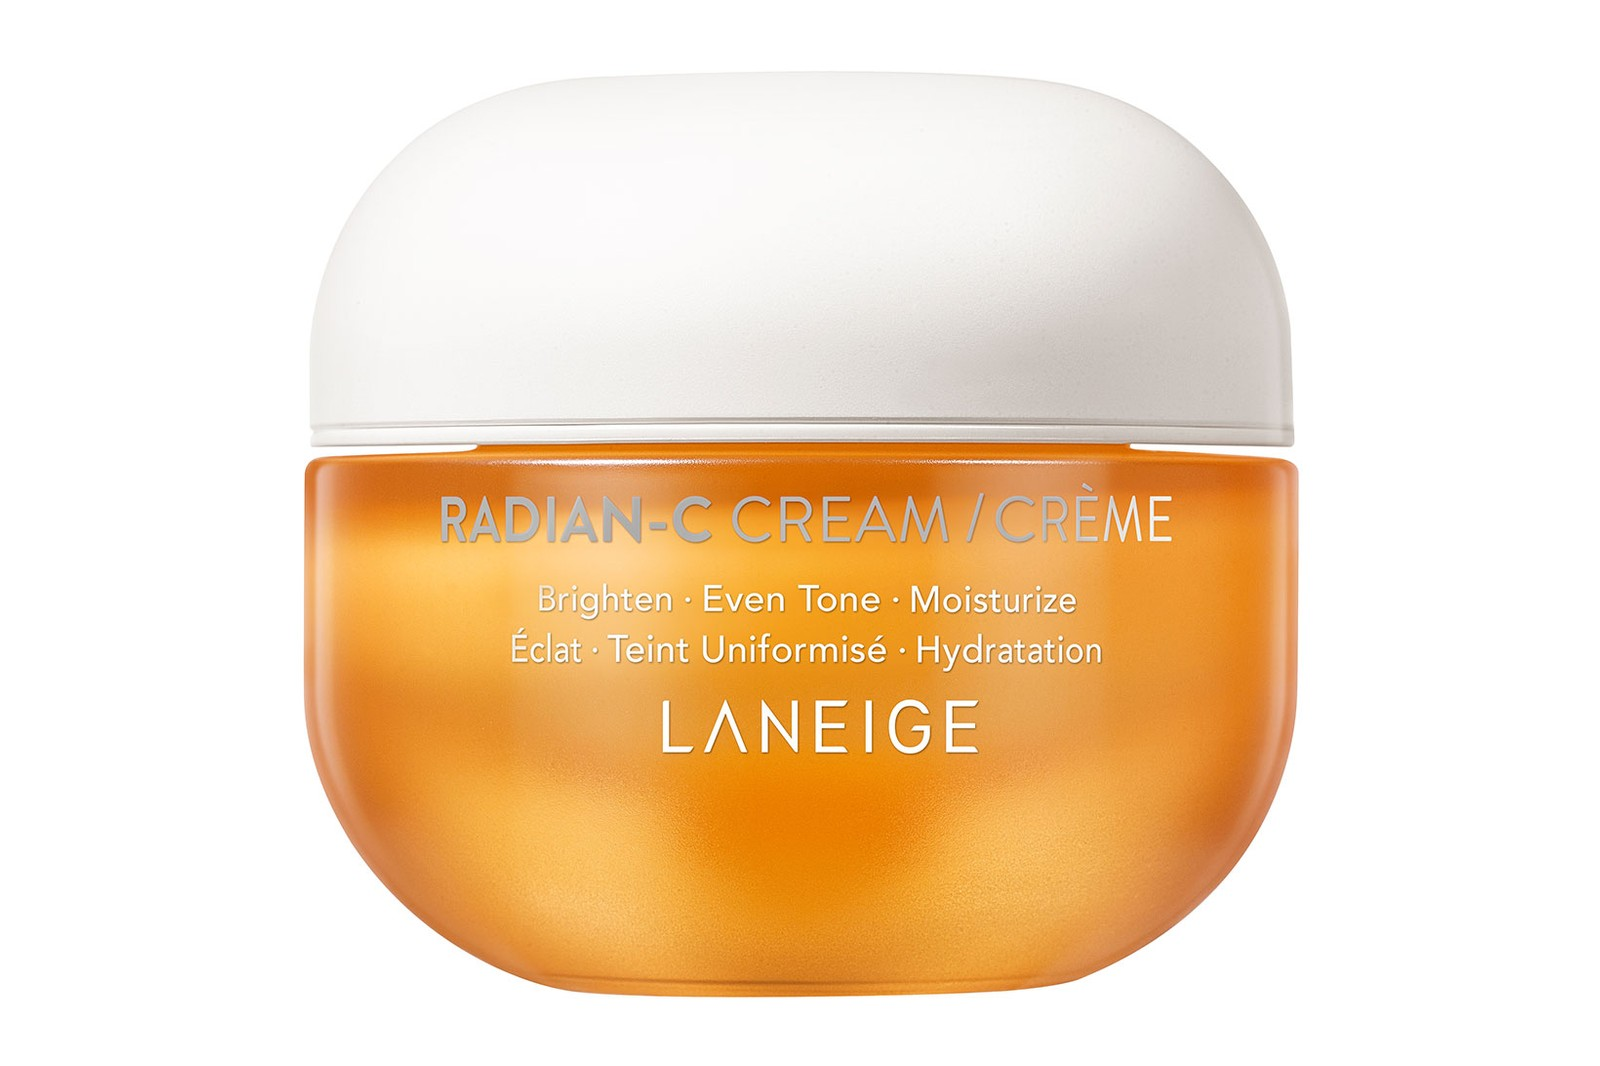 laneige radian-c facial creams moisturizers winter skincare vitamin brightening release where to buy